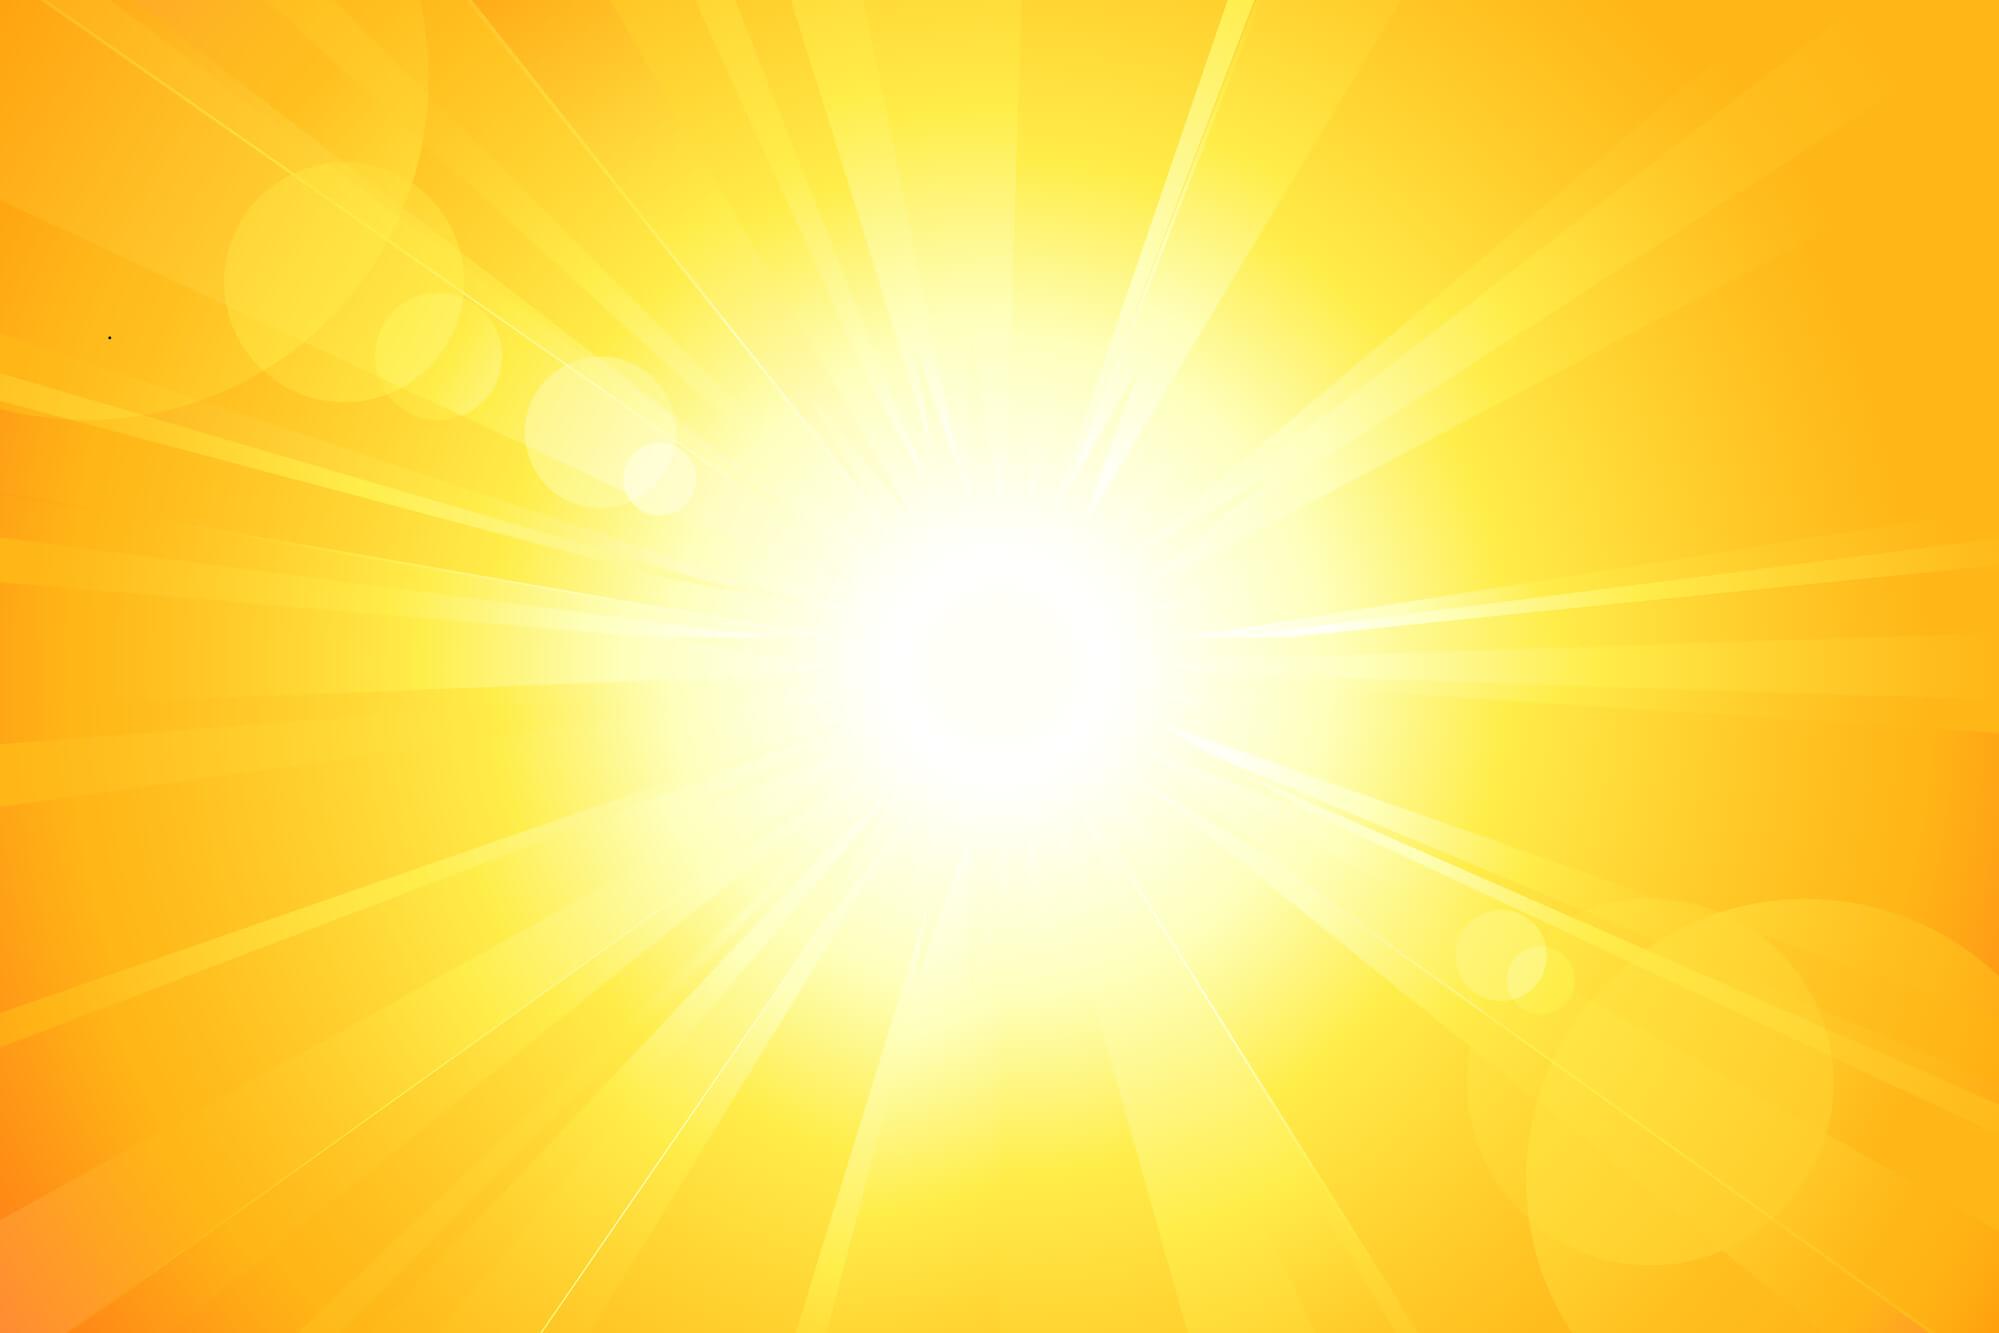 Bright Sun - sun protection water sports